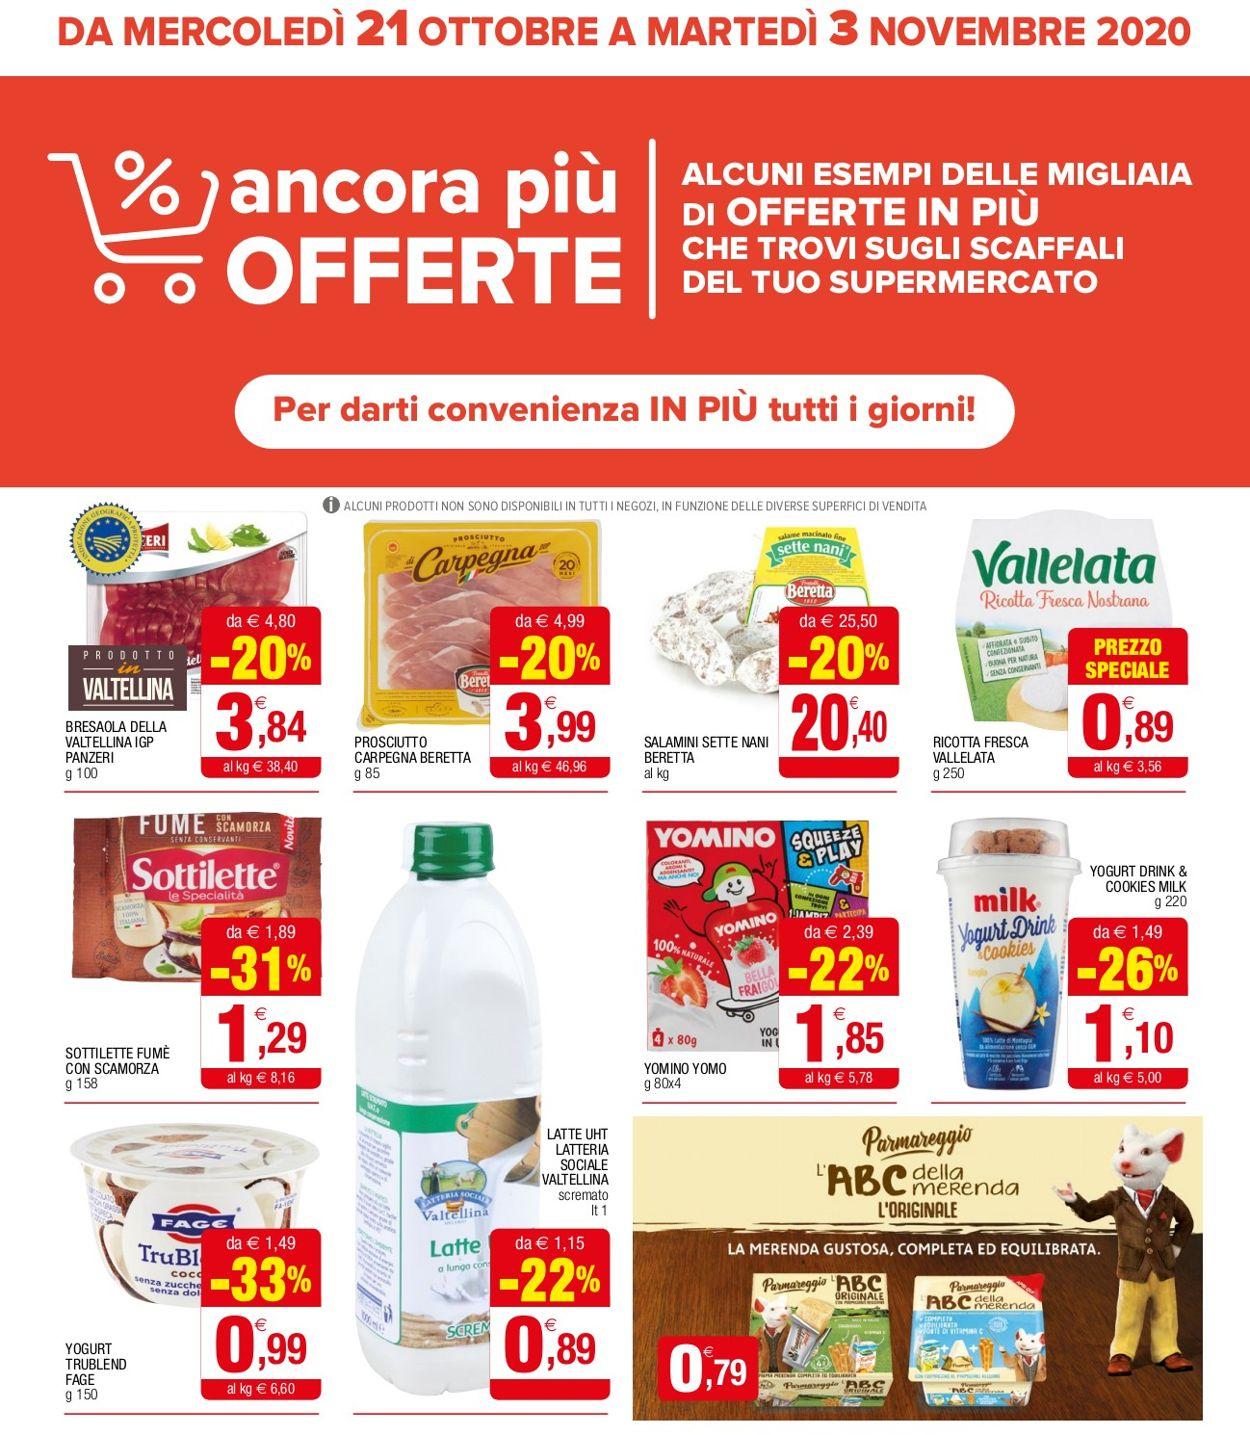 Volantino Iperal - Offerte 21/10-03/11/2020